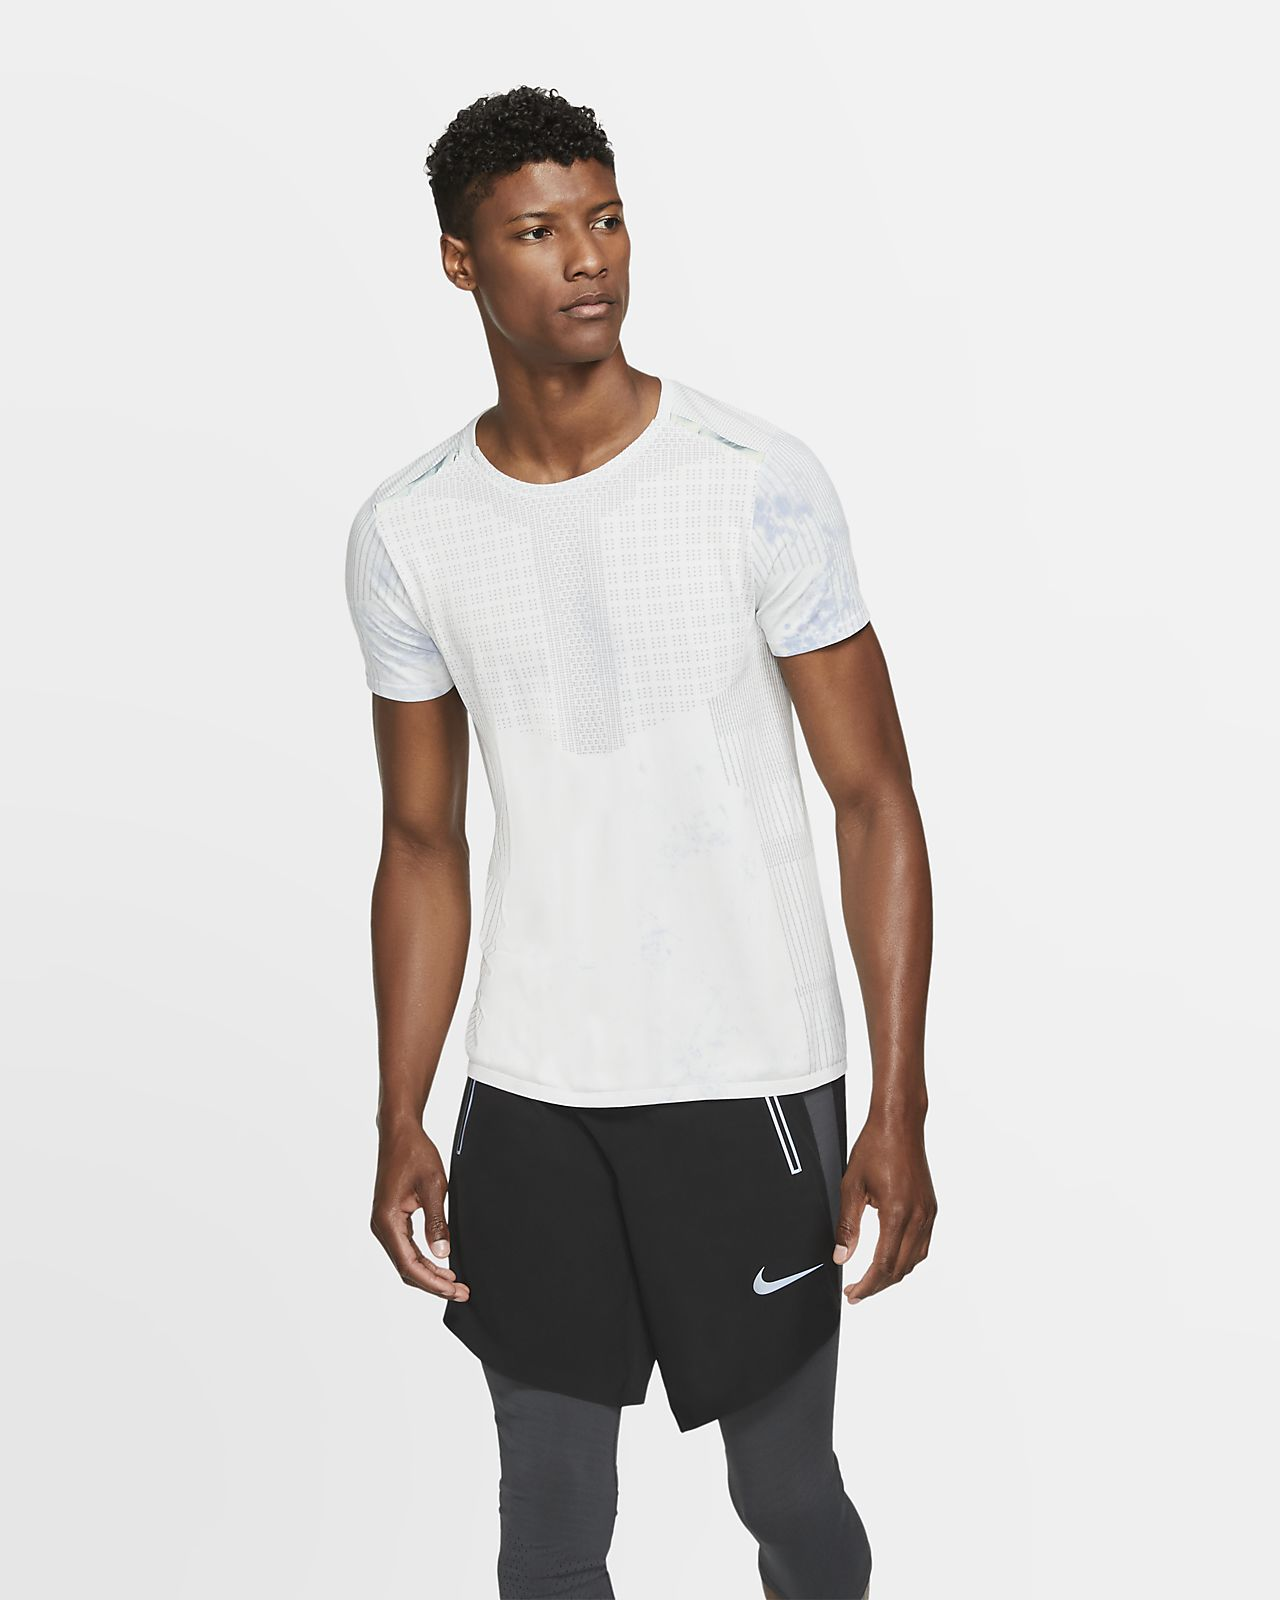 Prenda para la prte superior de manga corta para hombre Nike Tech Pack